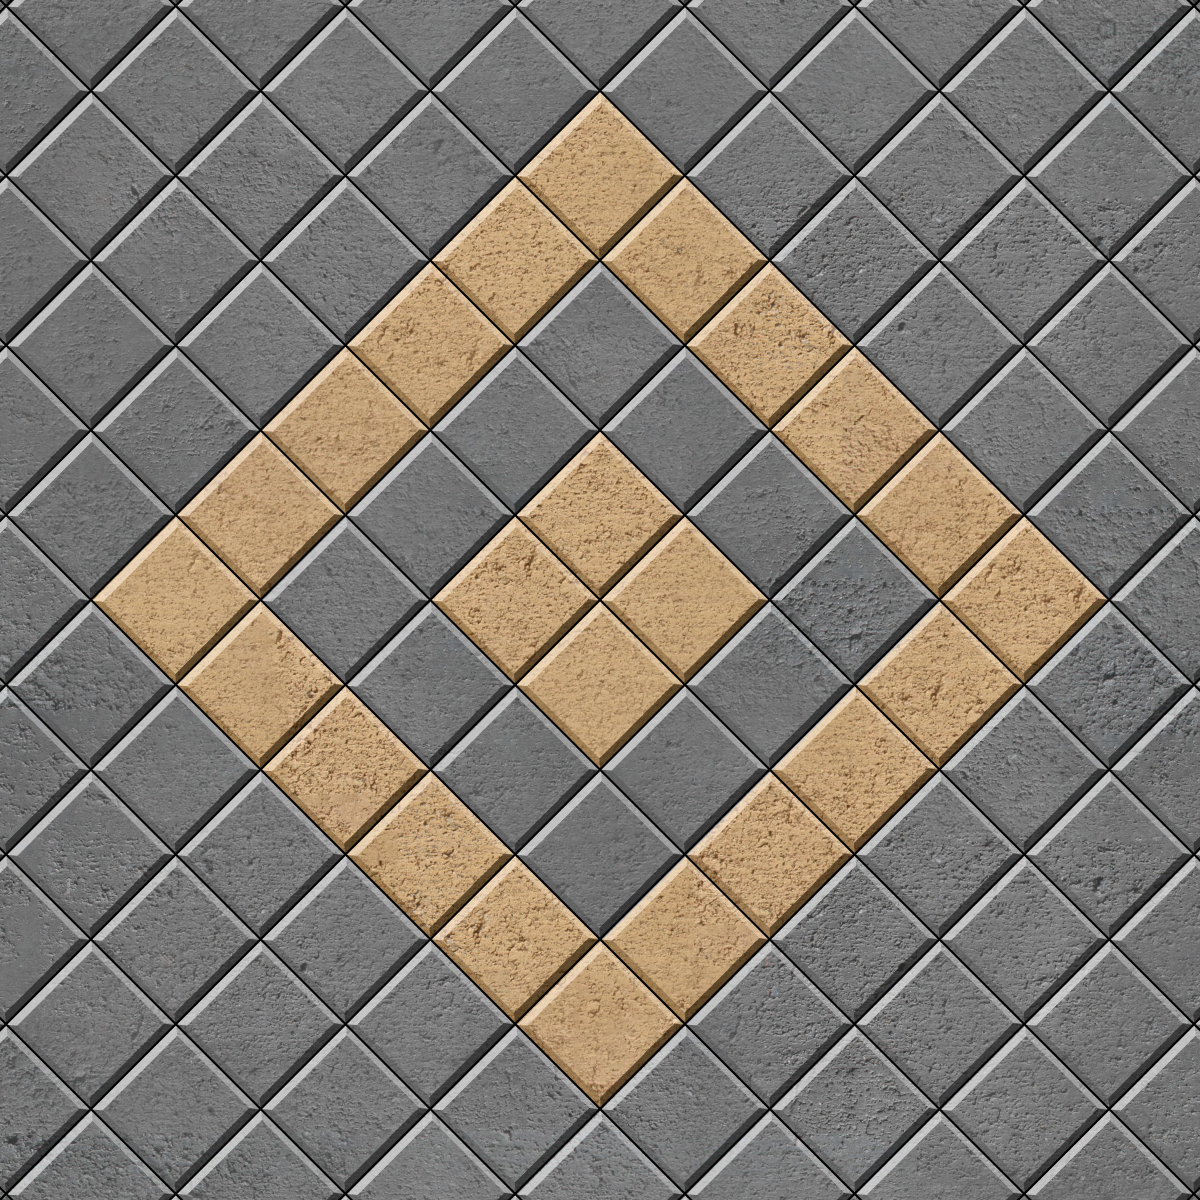 45 Stack Bond with contrasting diamond inlay